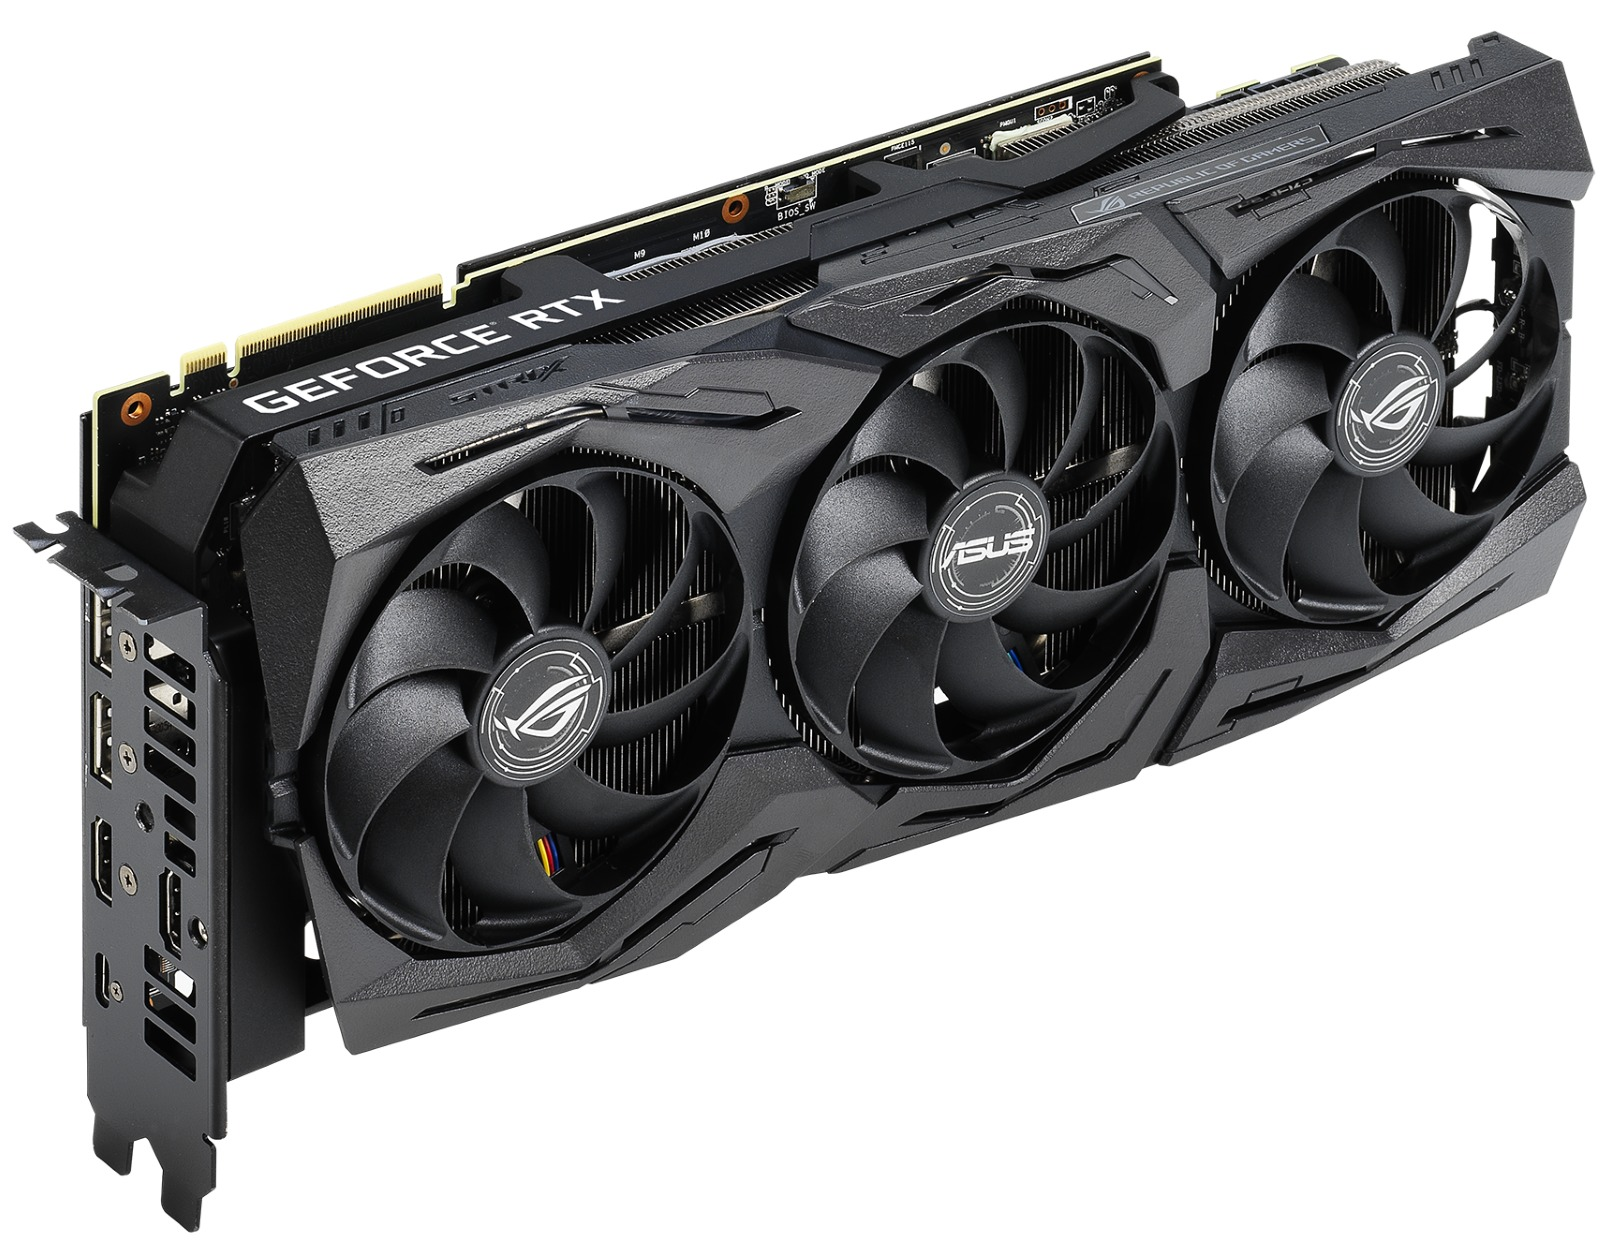 ASUS ROG Strix GeForce RTX 2080 8GB Graphics Card image